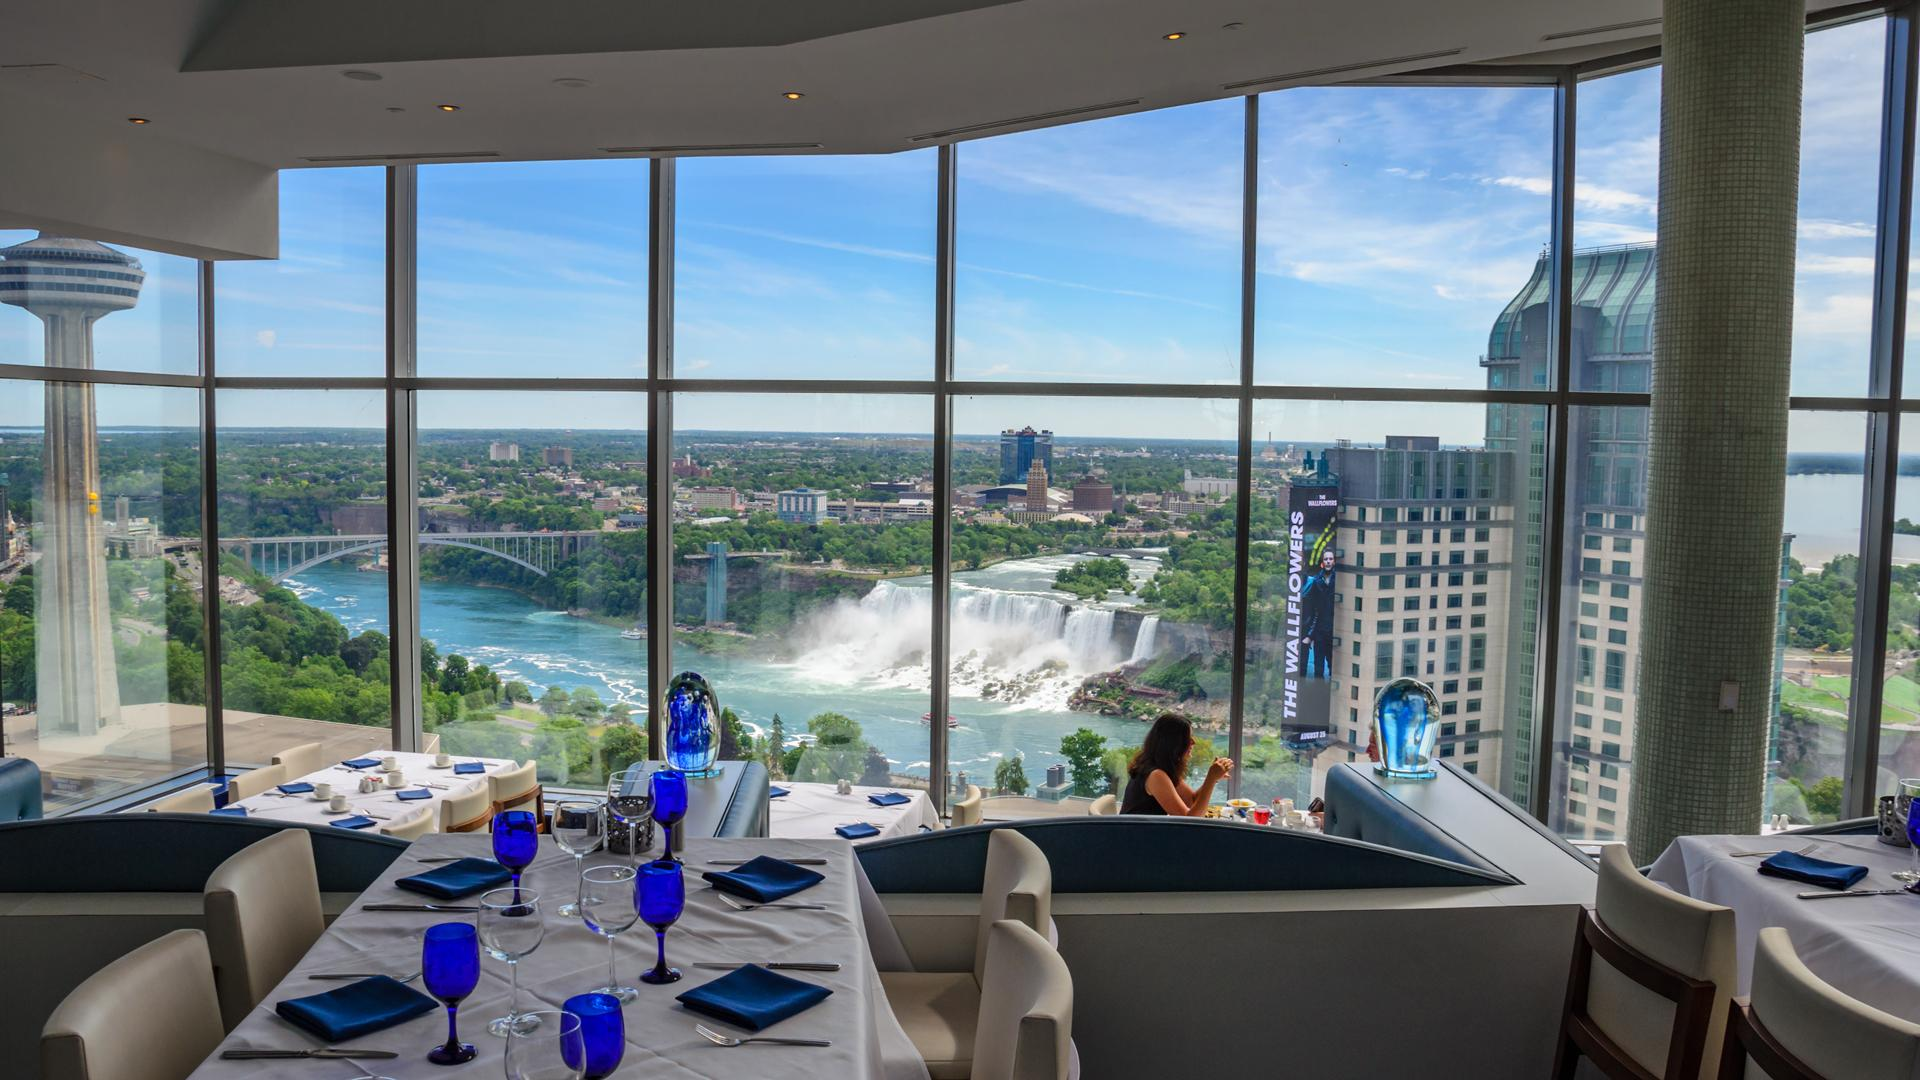 Watermark rooftop restaurant at the Hilton Niagara Falls